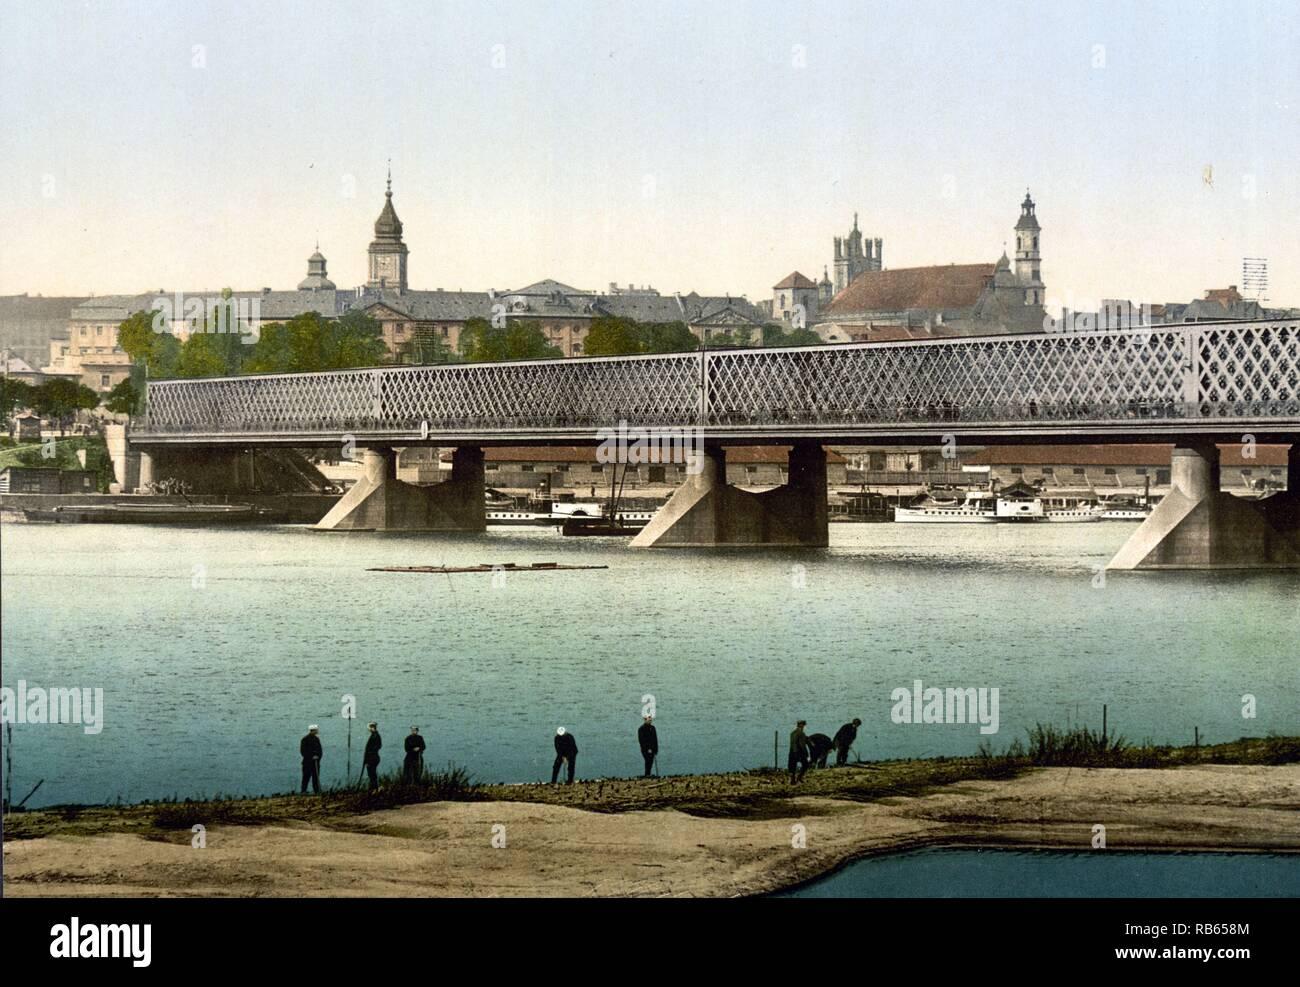 The Iron bridge; Warsaw; Russia (i.e. Warsaw; Poland) - Stock Image